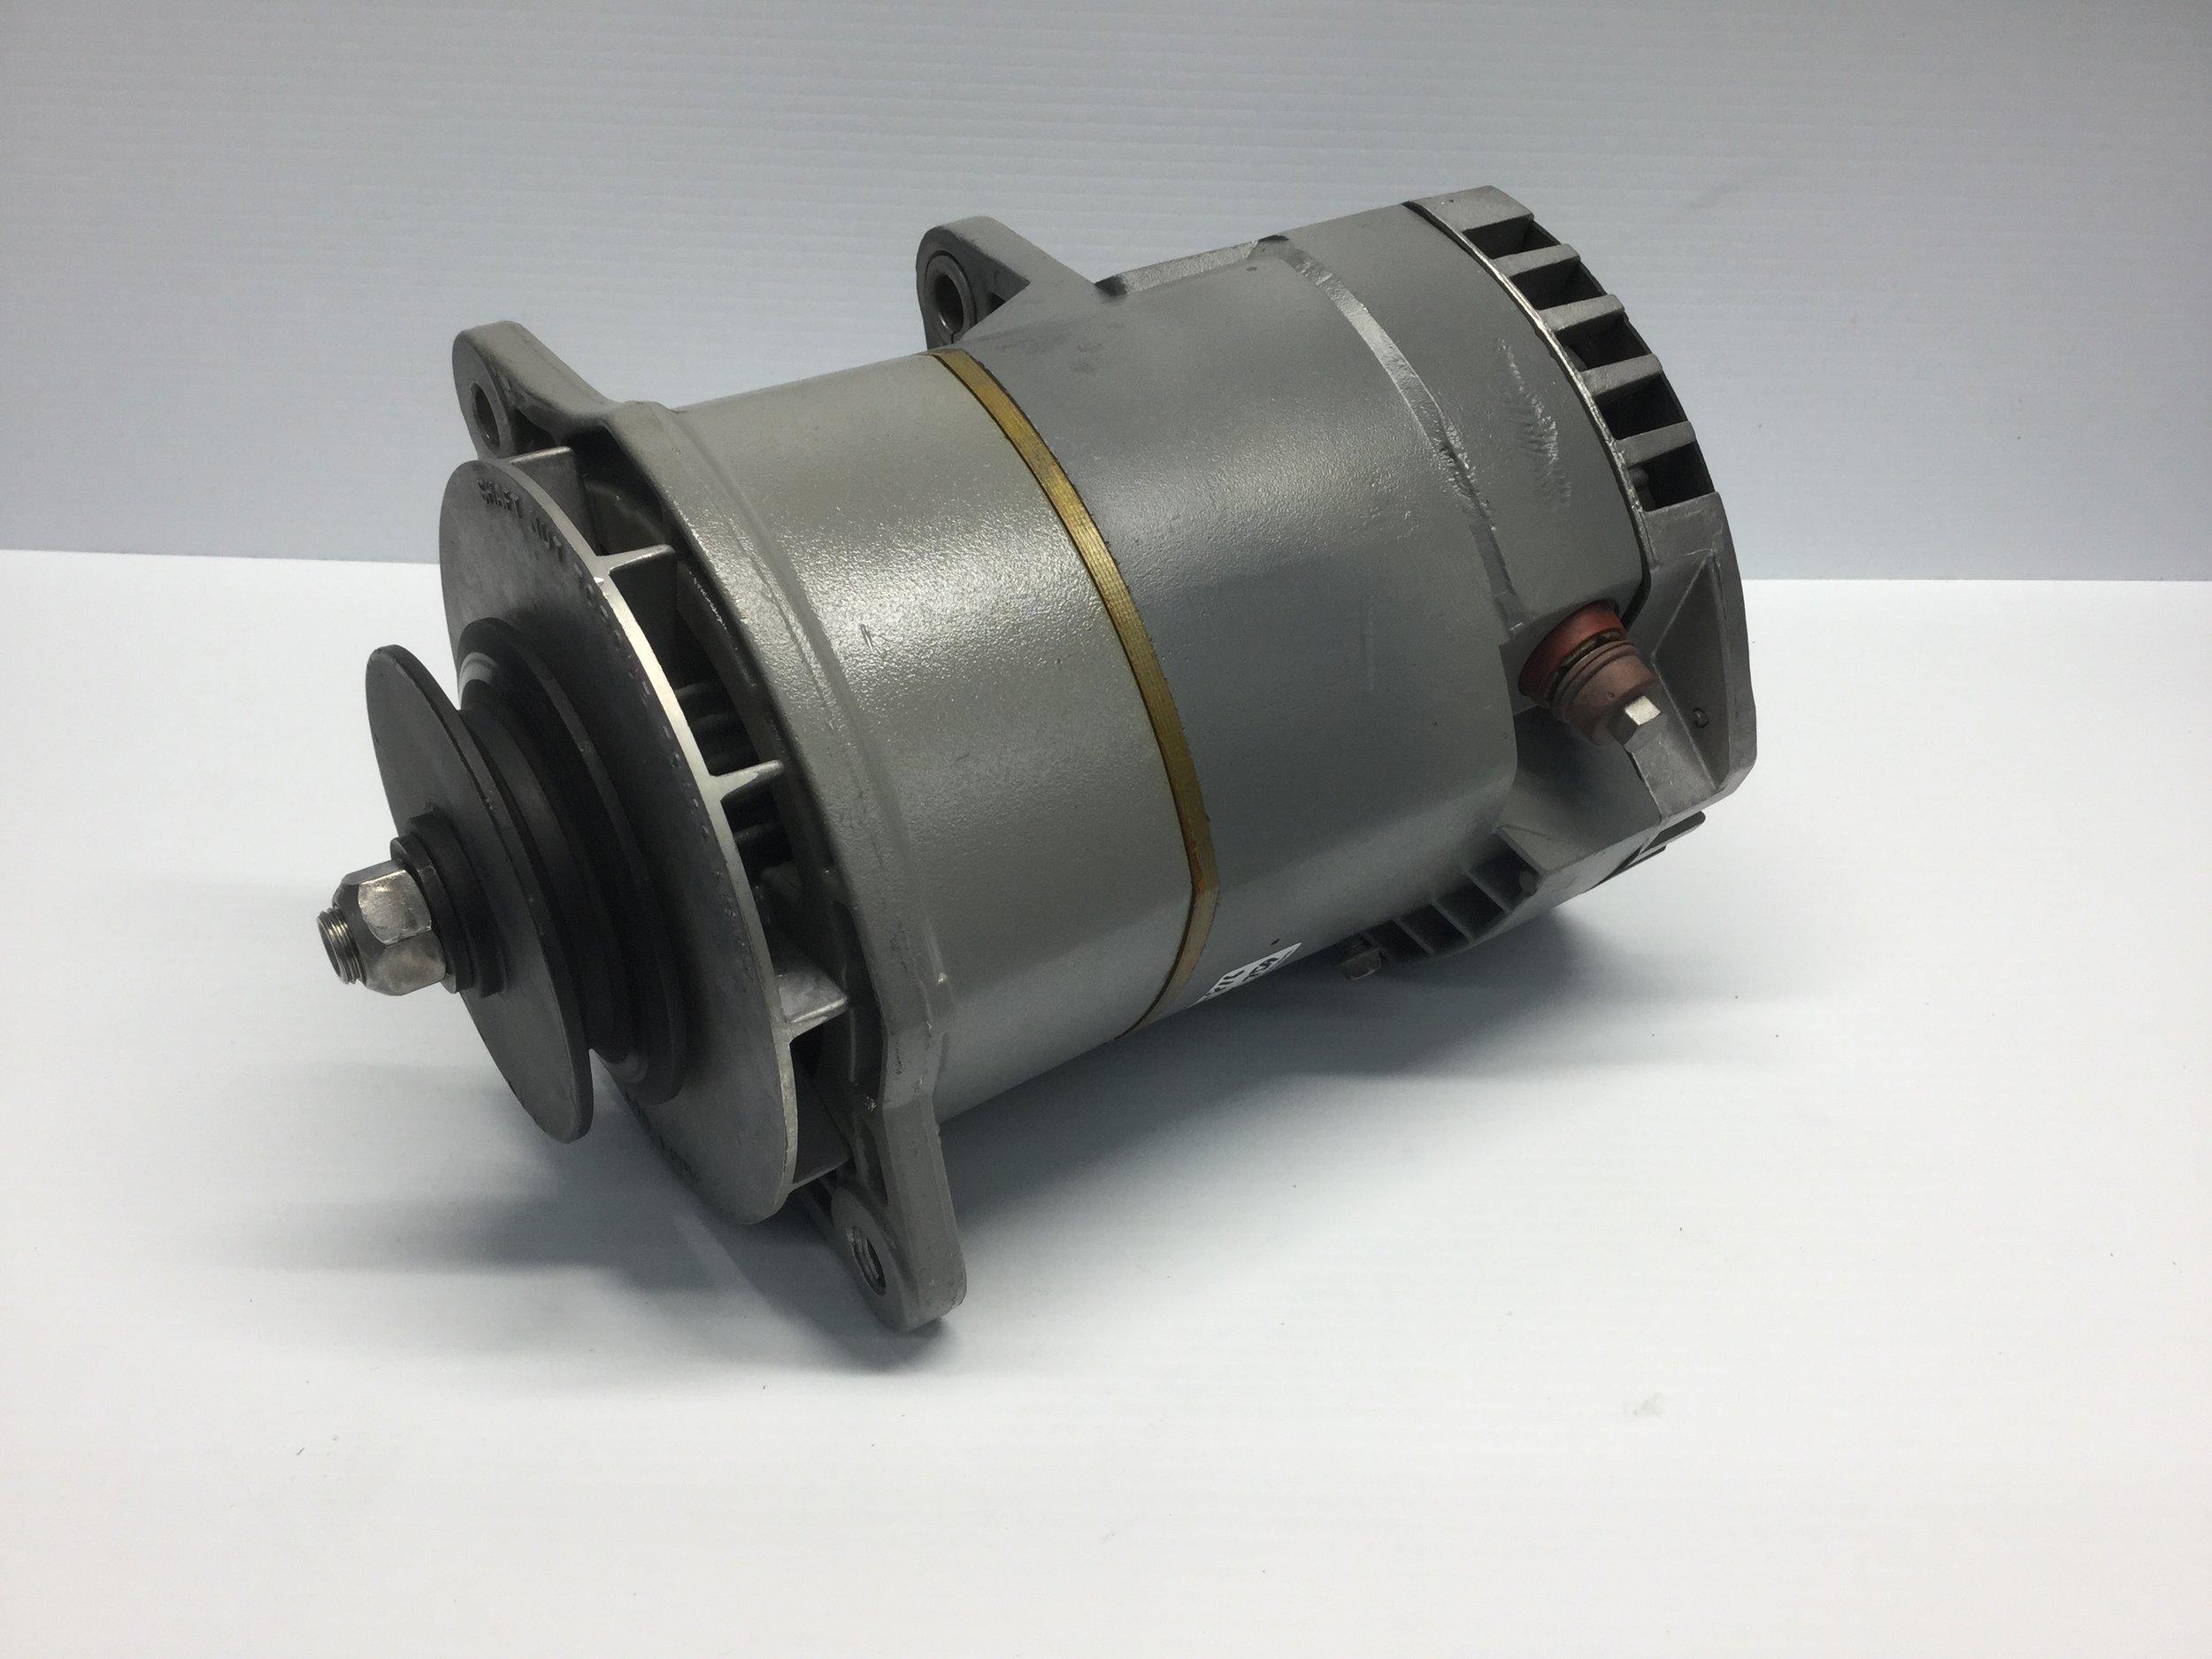 Delco Remy Alternator >> Delco Remy Alternator Part 214318 B F Auto Electric Calgary Ab